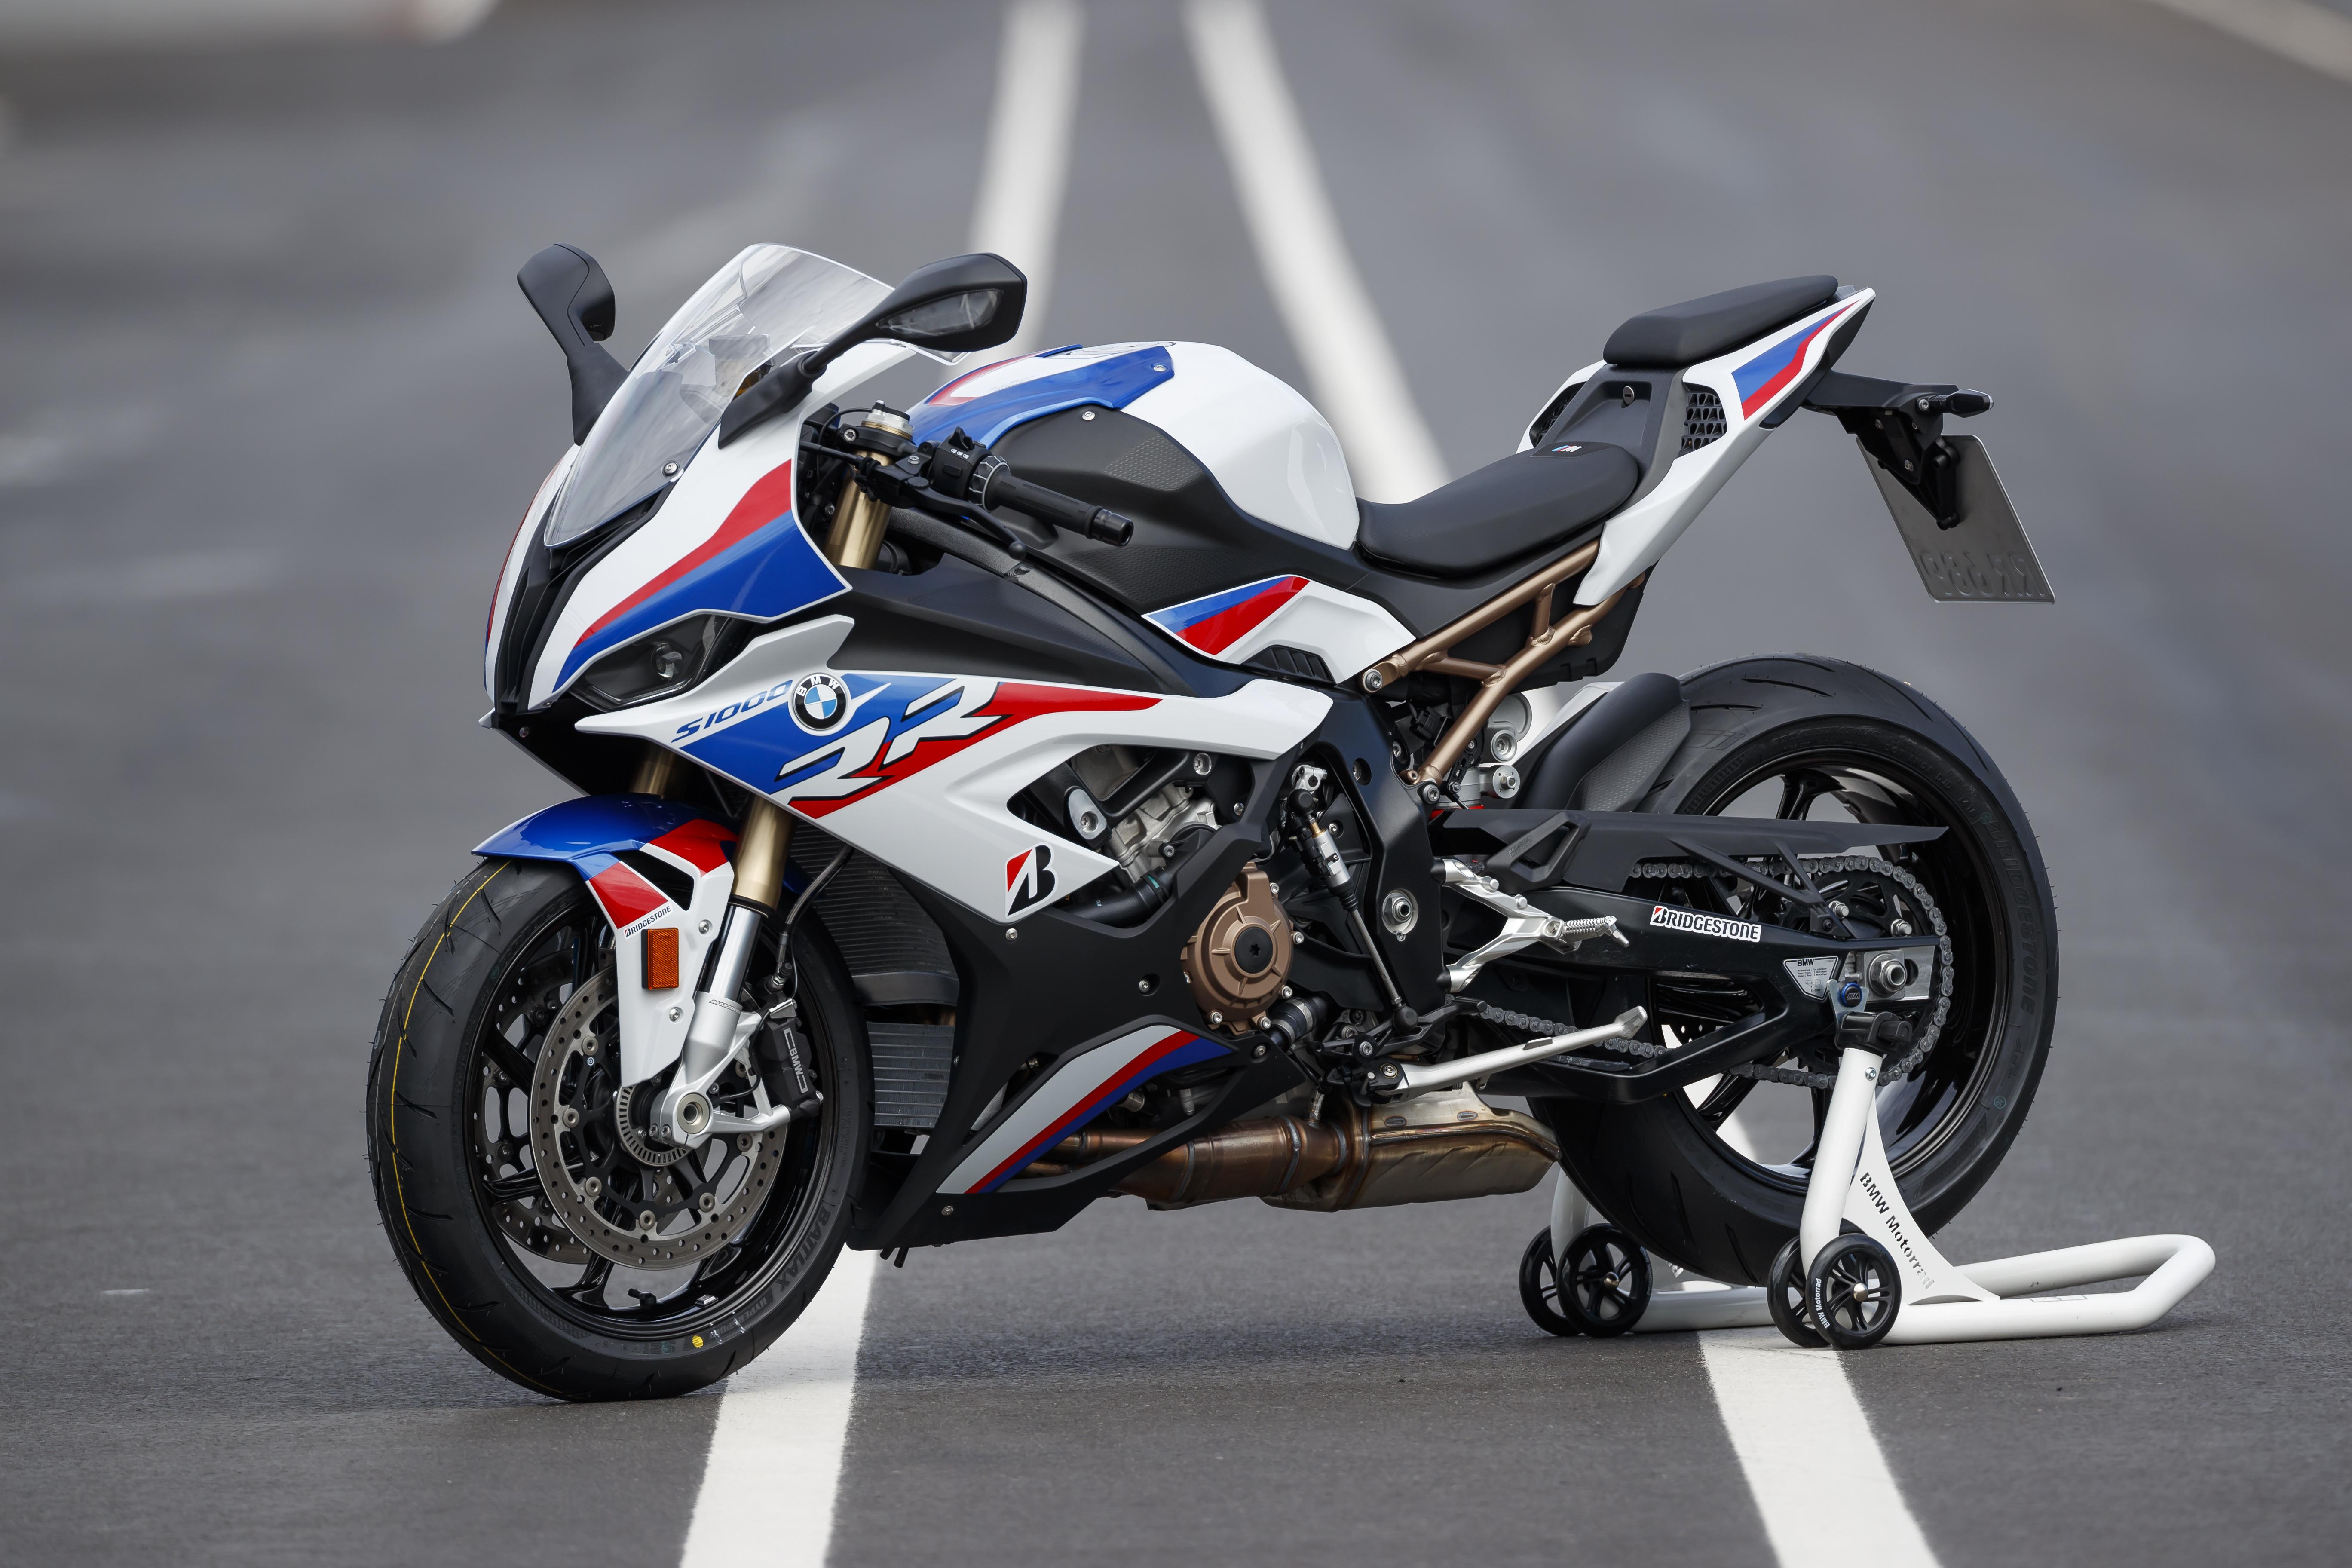 2020 BMW S1000RR Recalled for Oil Leaks - Asphalt & Rubber